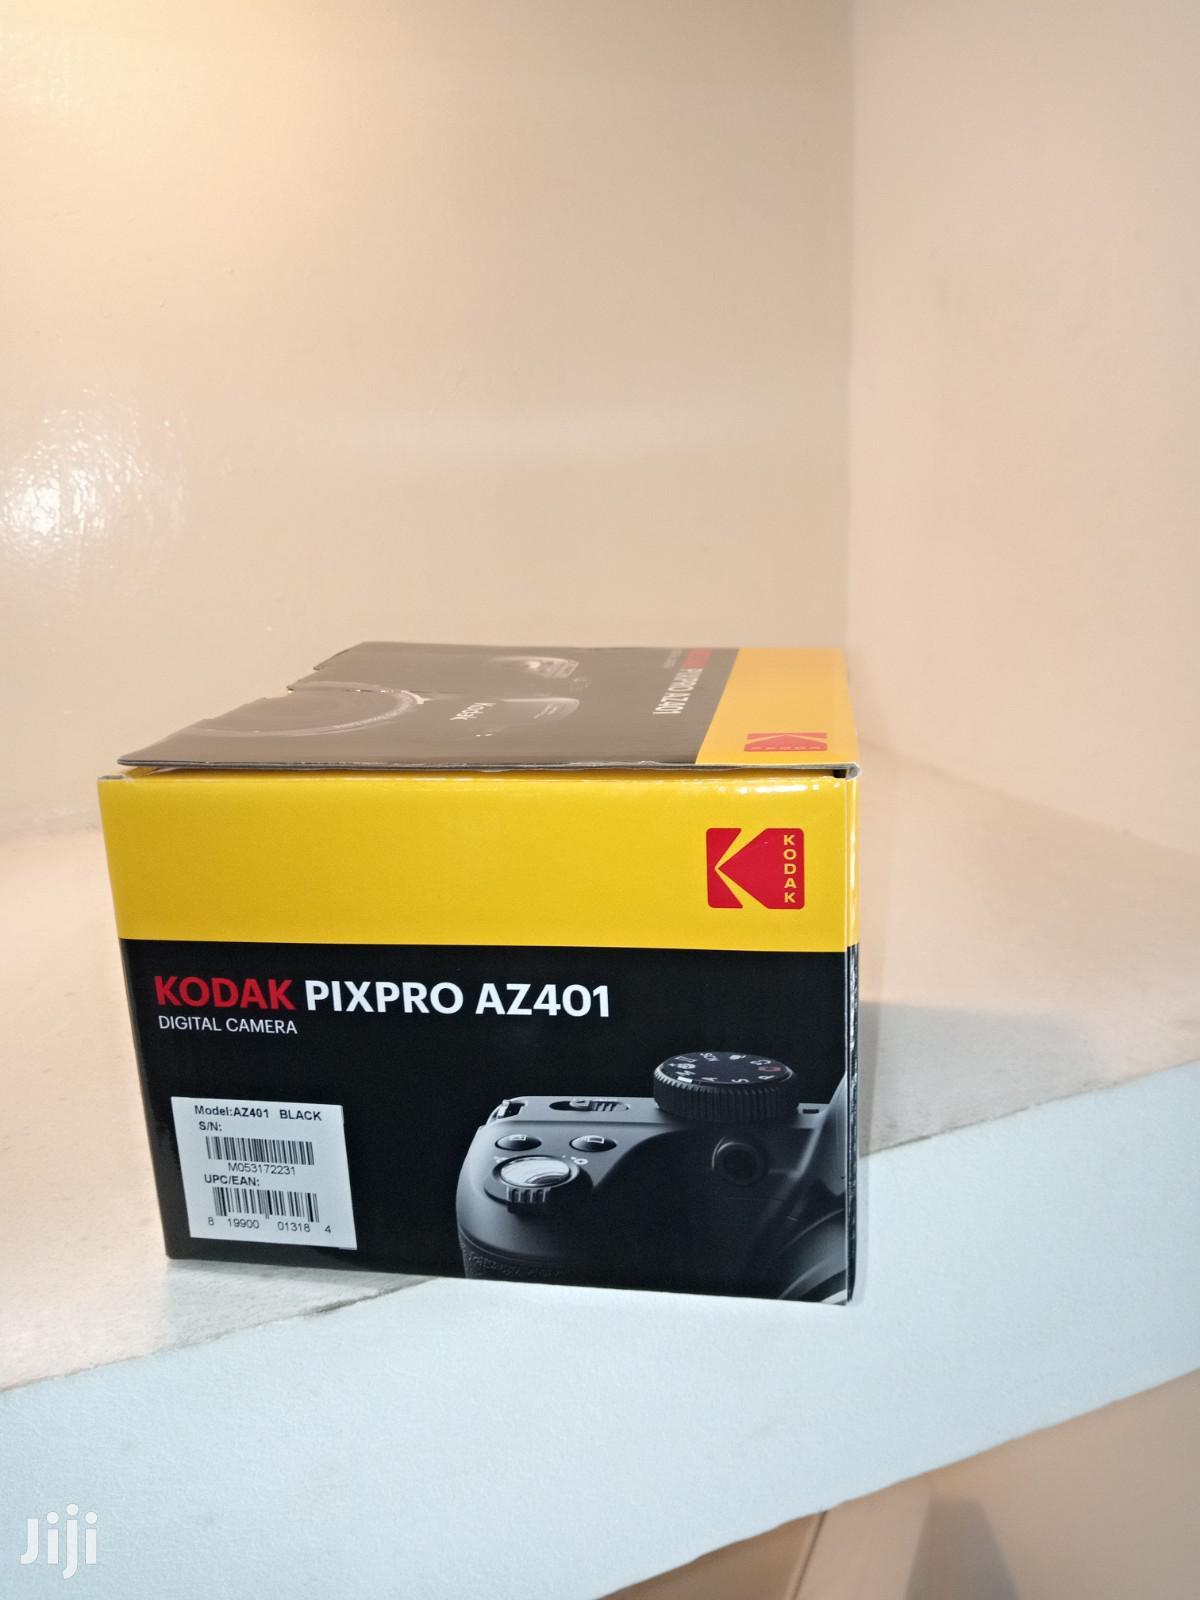 Kodak Pixpro AZ401 Digital Camera.